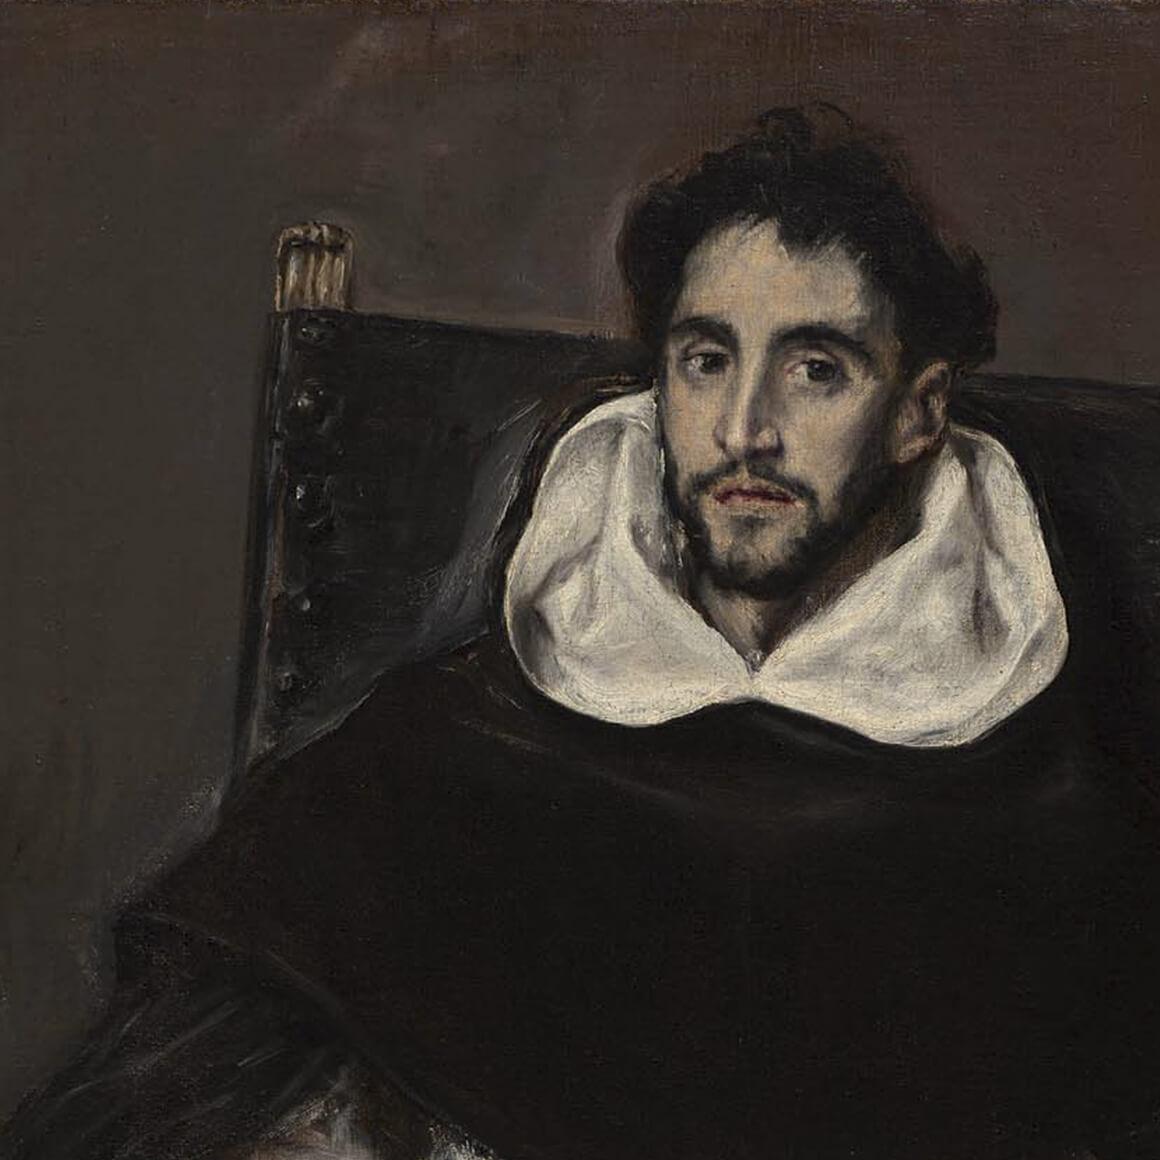 Detail of El Greco's painting, Fray Hortensio Felix Paravicino